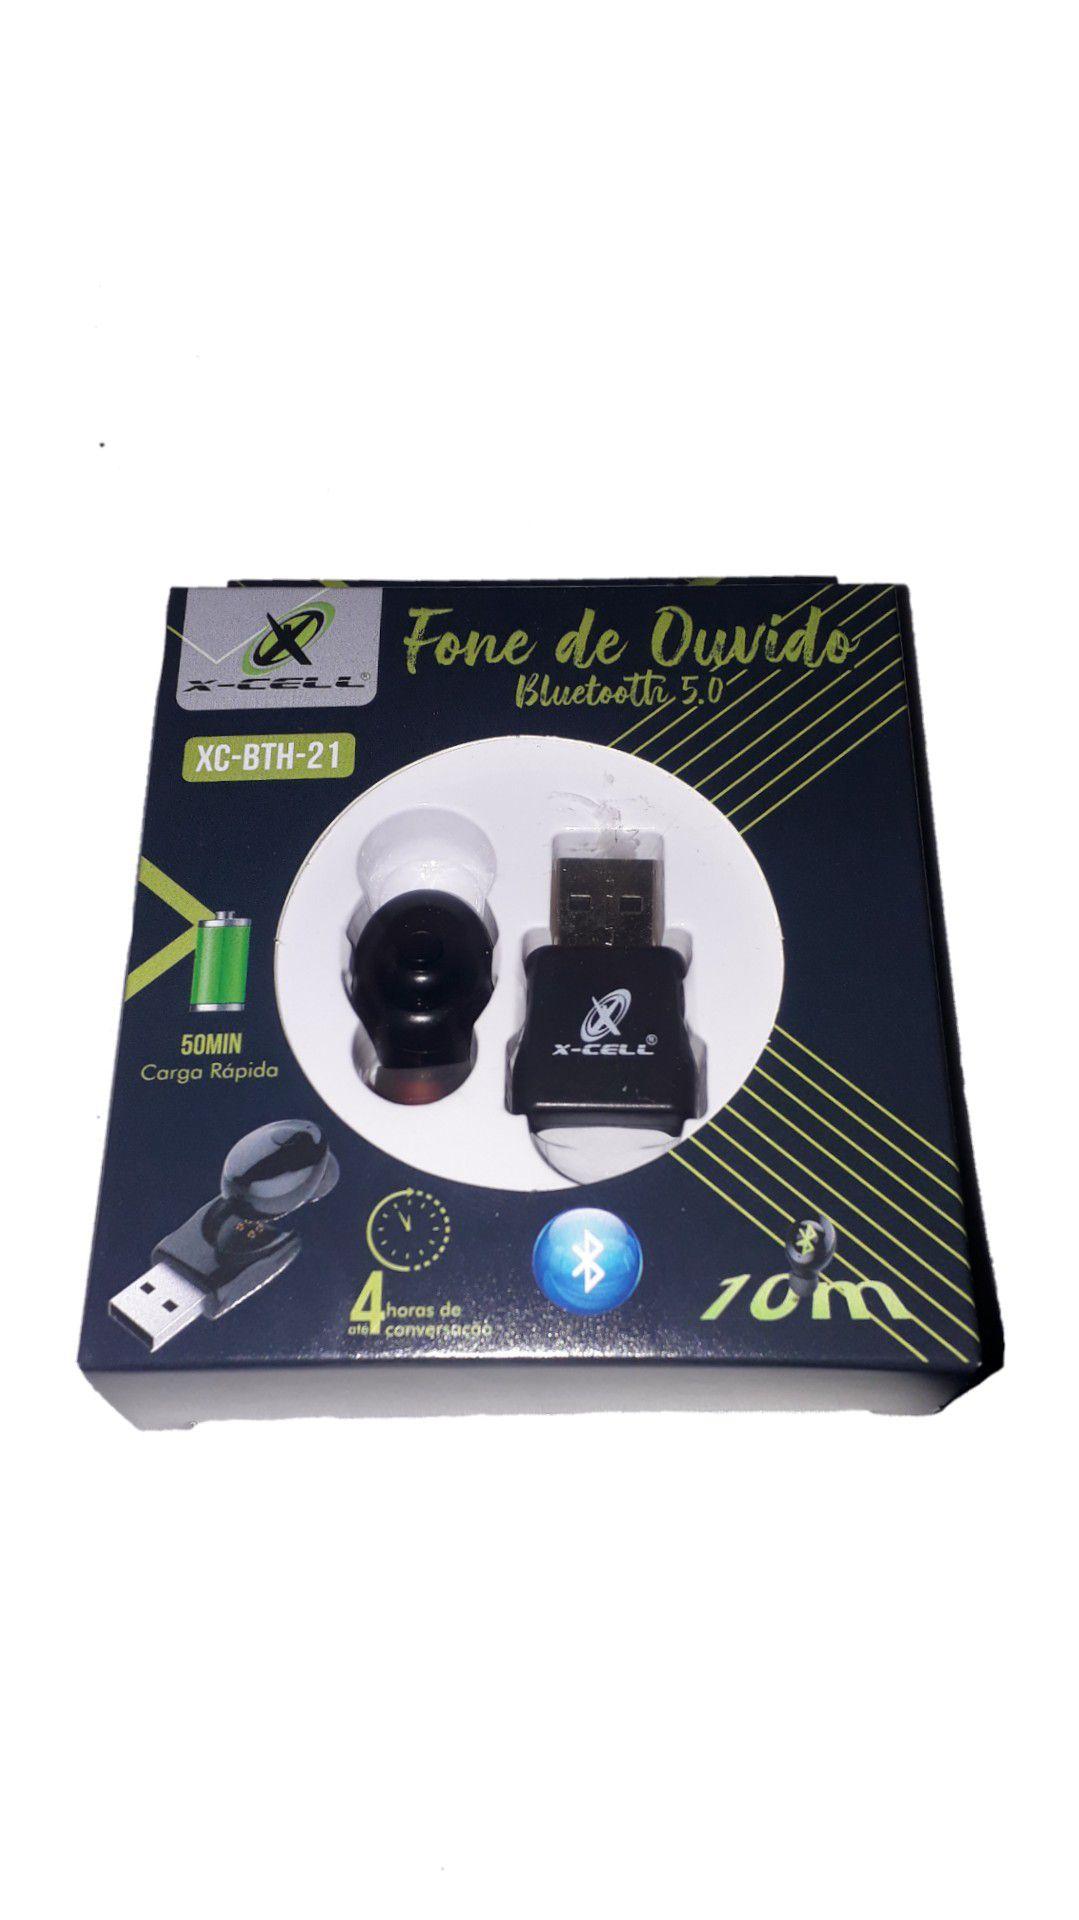 FONE DE OUVIDO XCELL BLUETOOH XC-BTH21 CARREGADOR USB